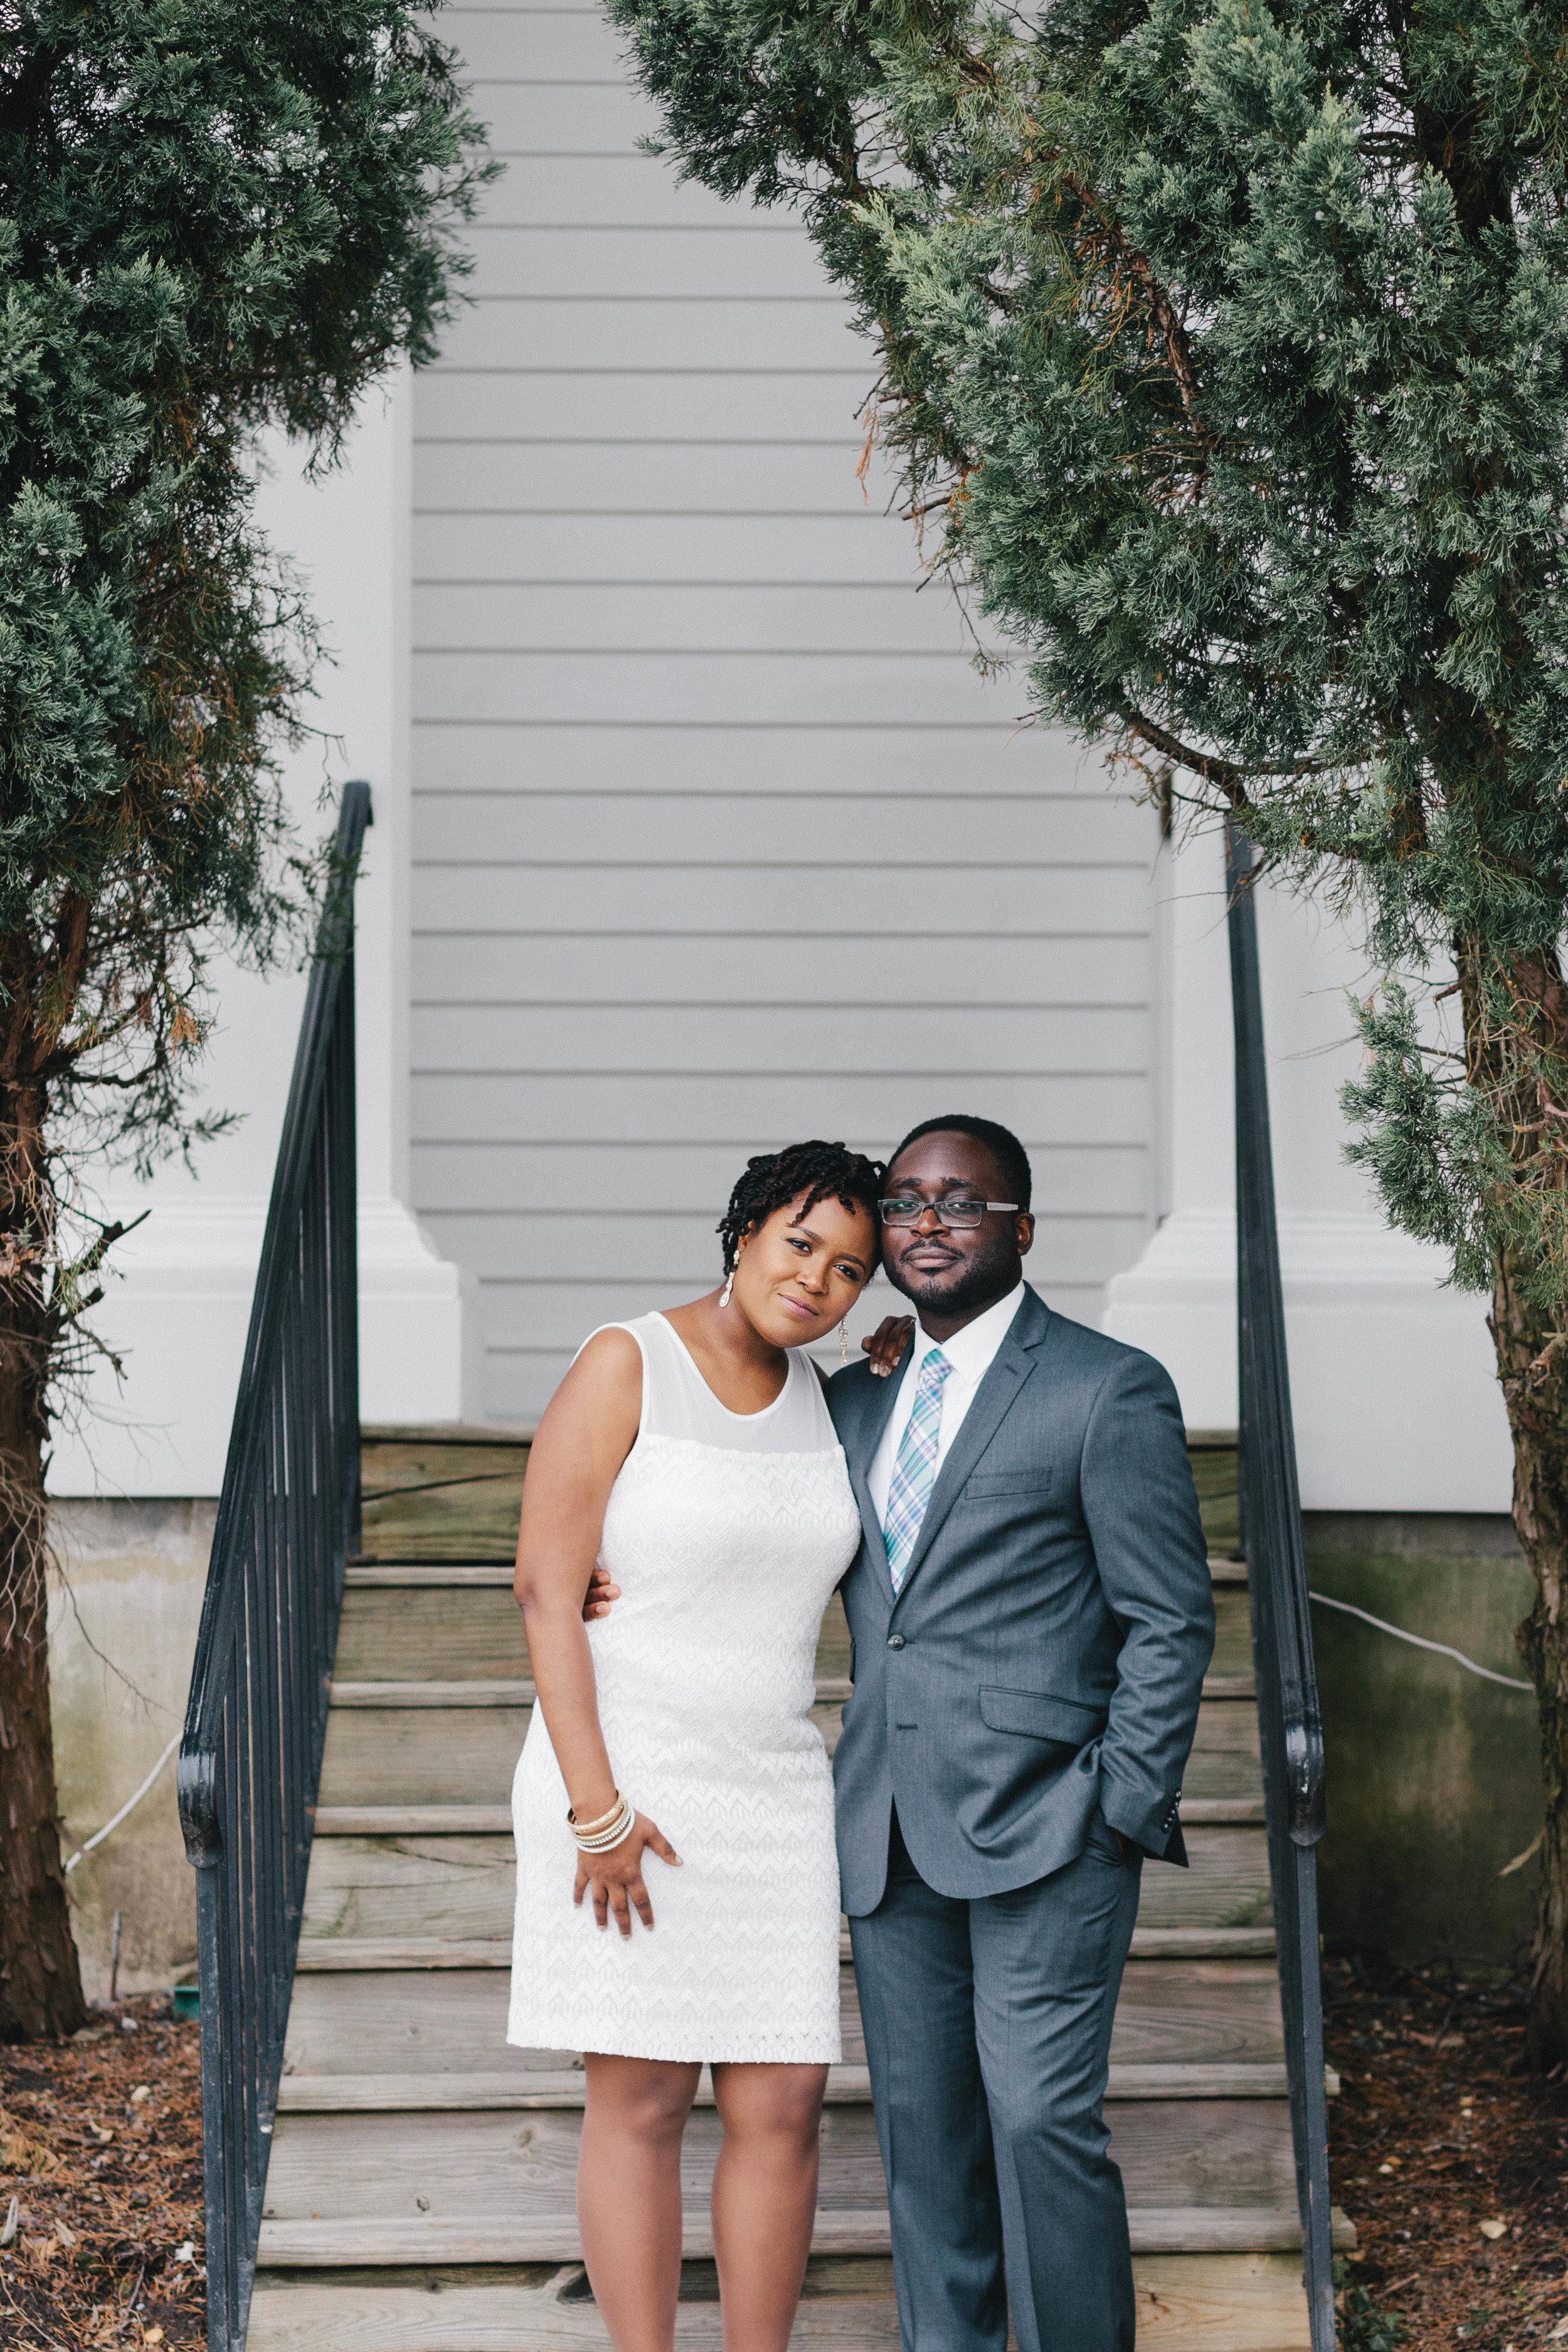 Website-Victoria Ruan Photography-Weddings-2.jpg